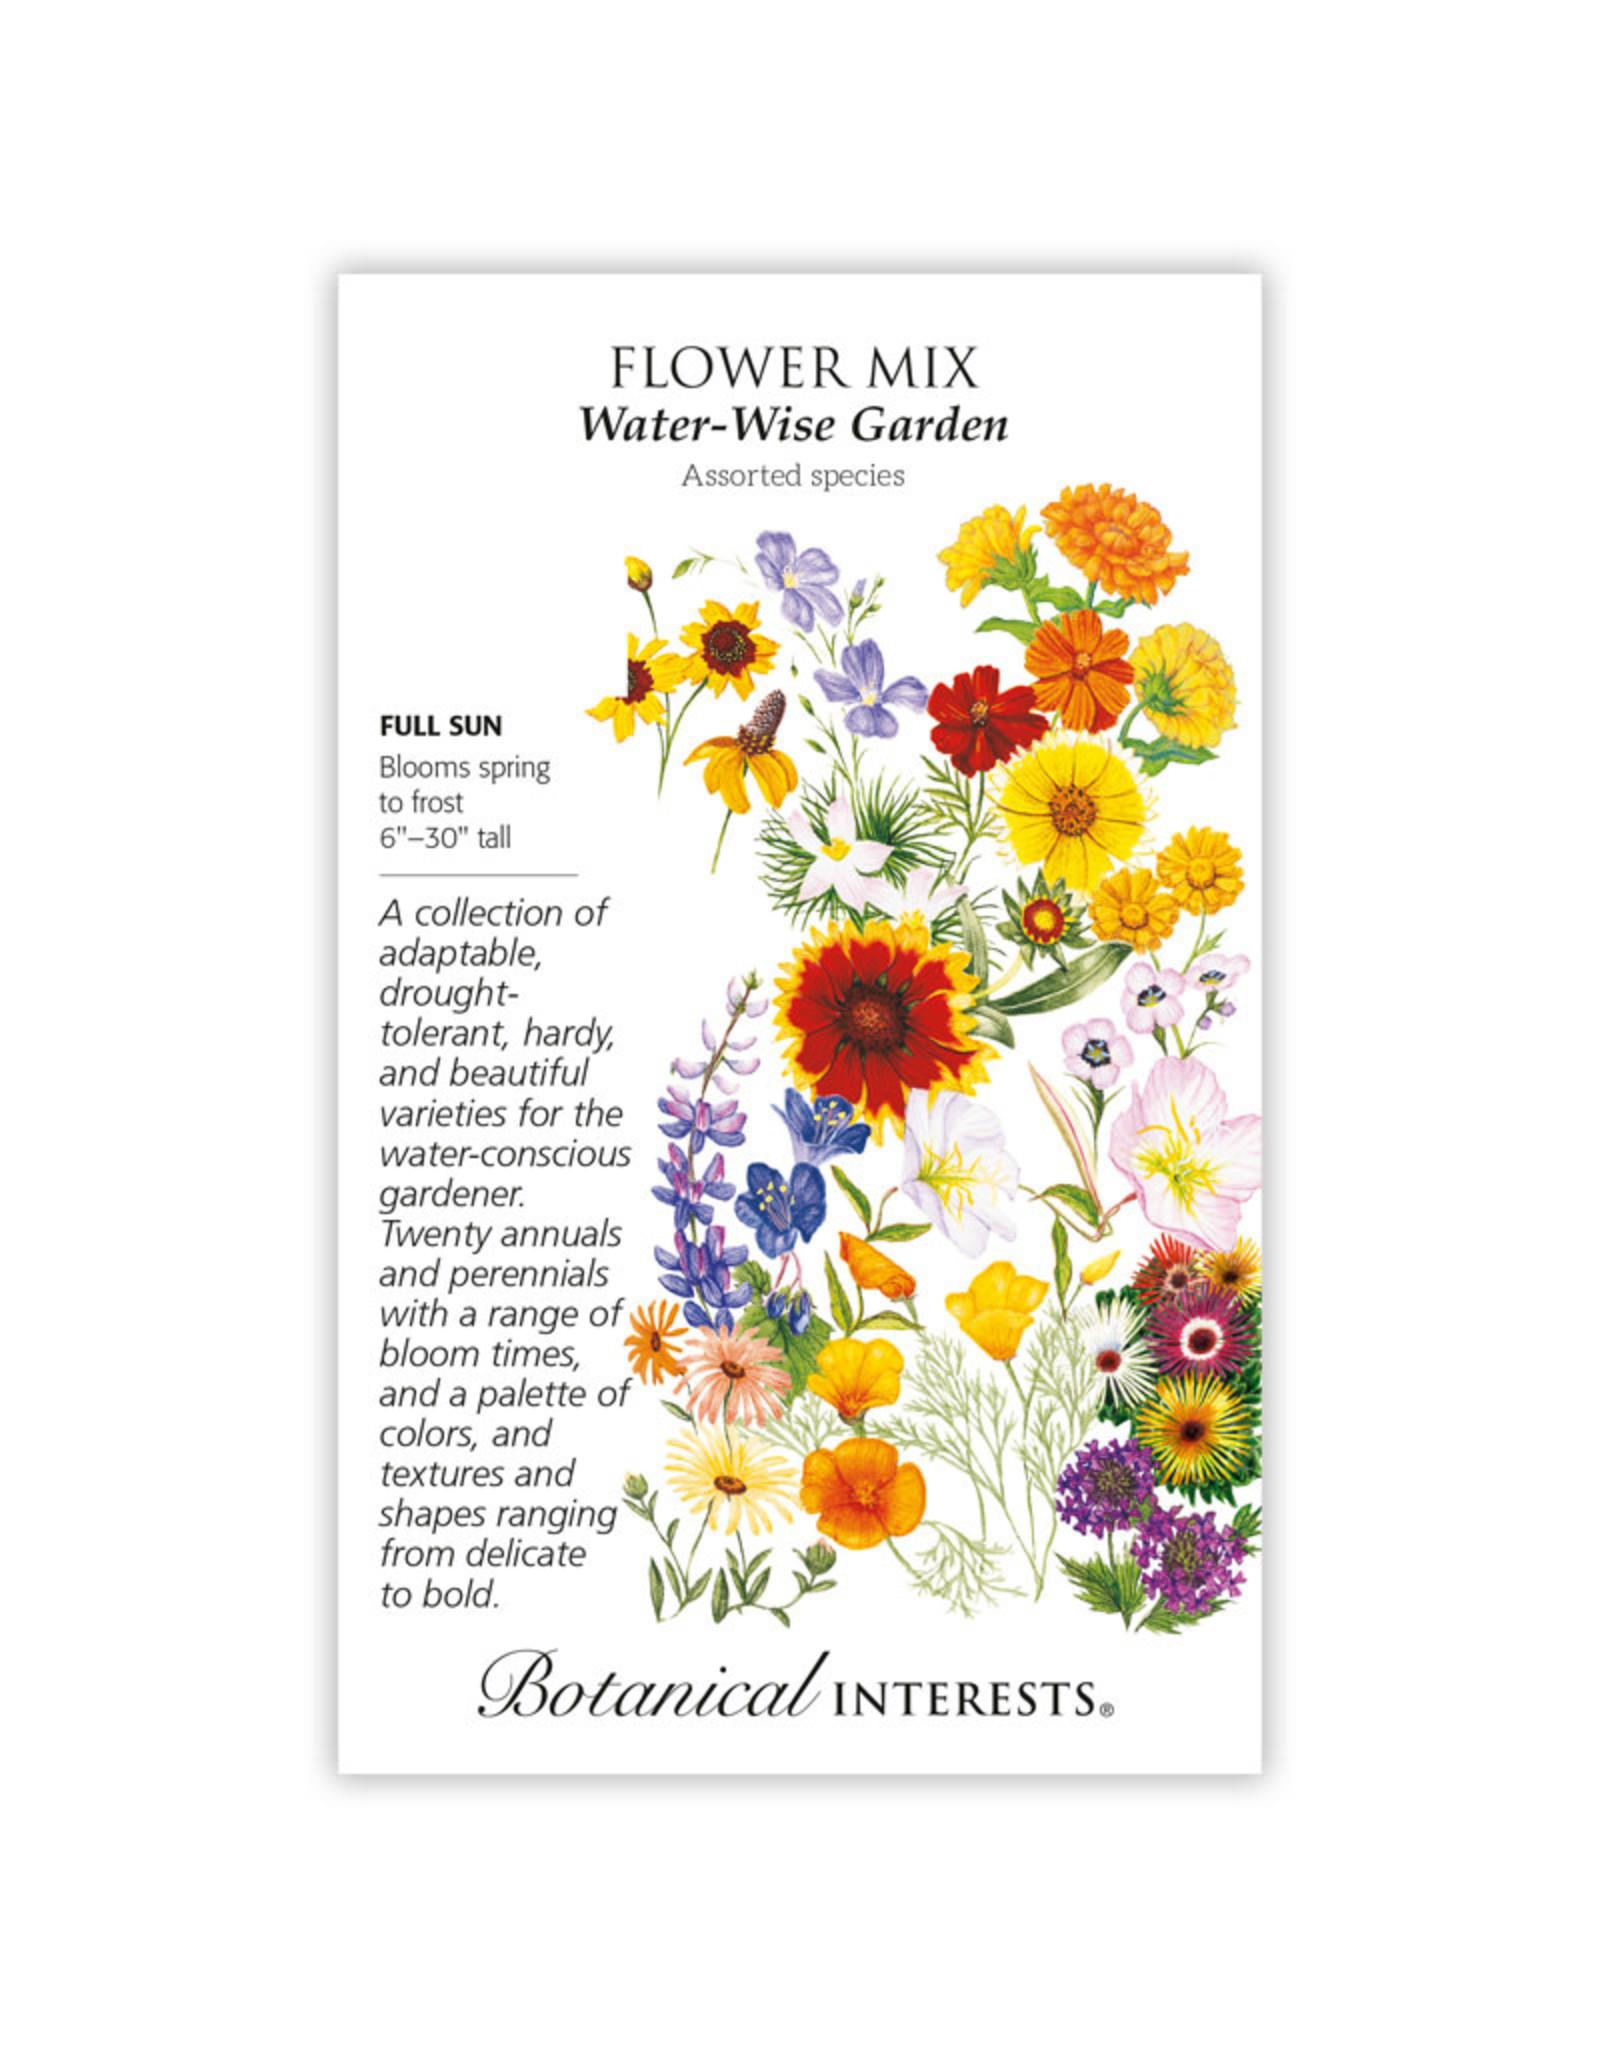 Seeds - Flower Mix Water-Wise Garden, Large